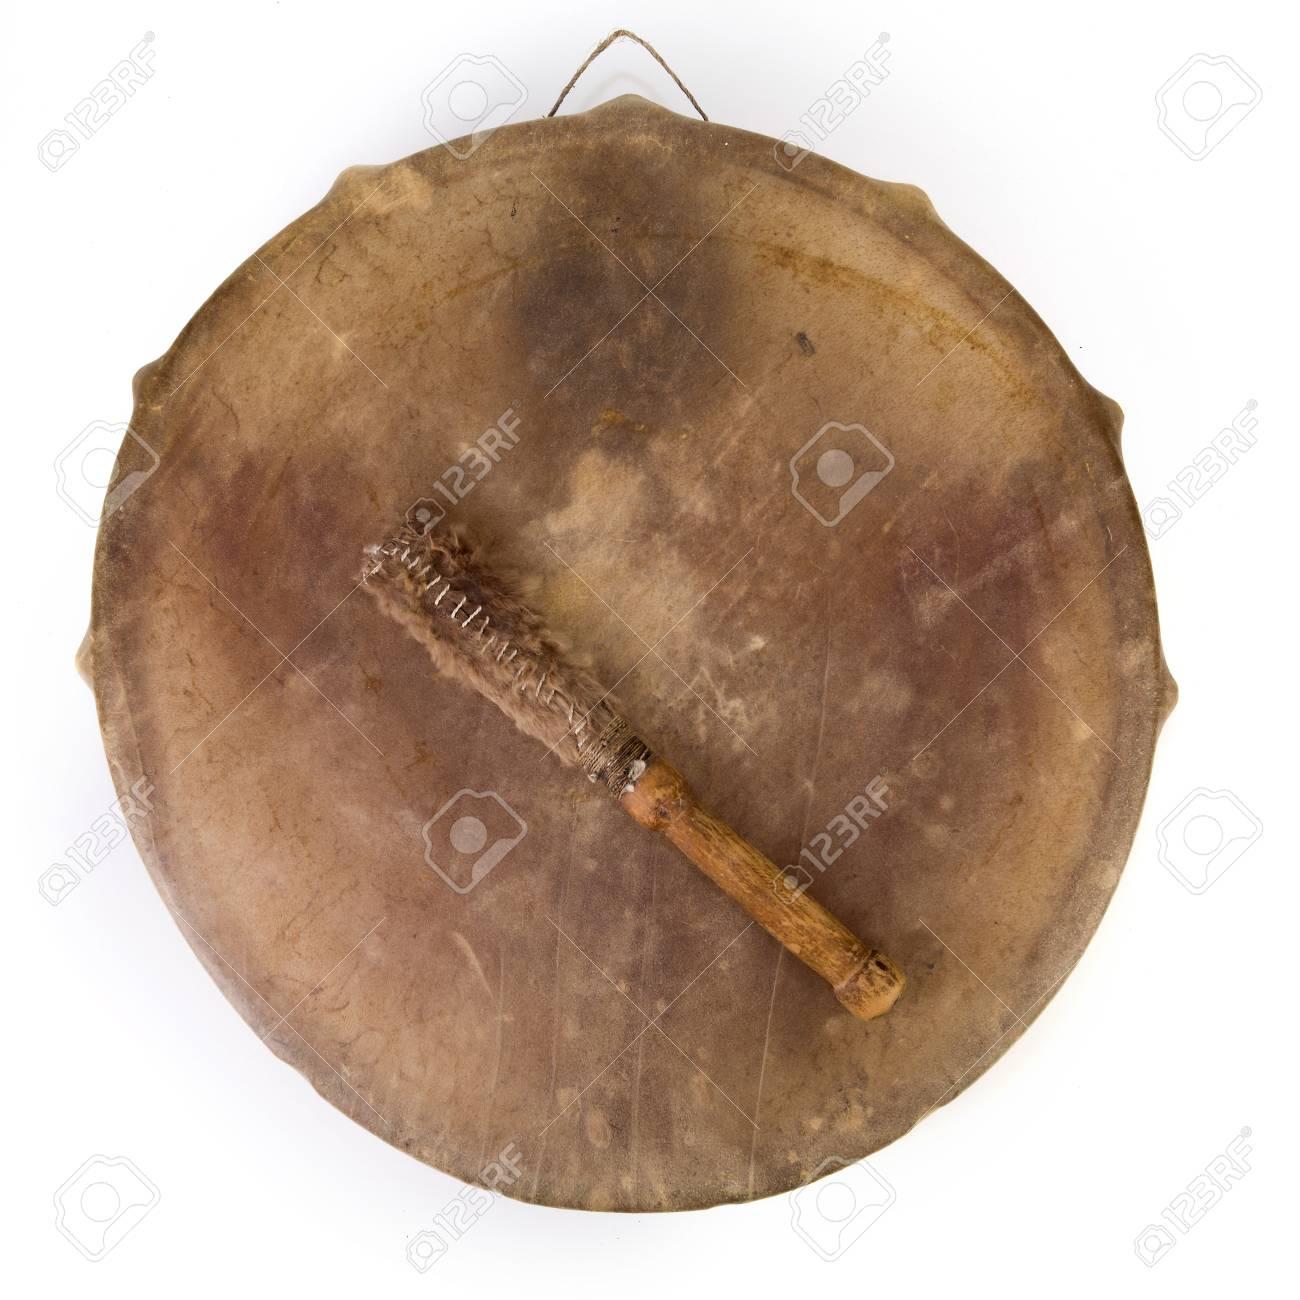 Ancient indian tambourine drum drumstick replica Stock Photo - 94345995